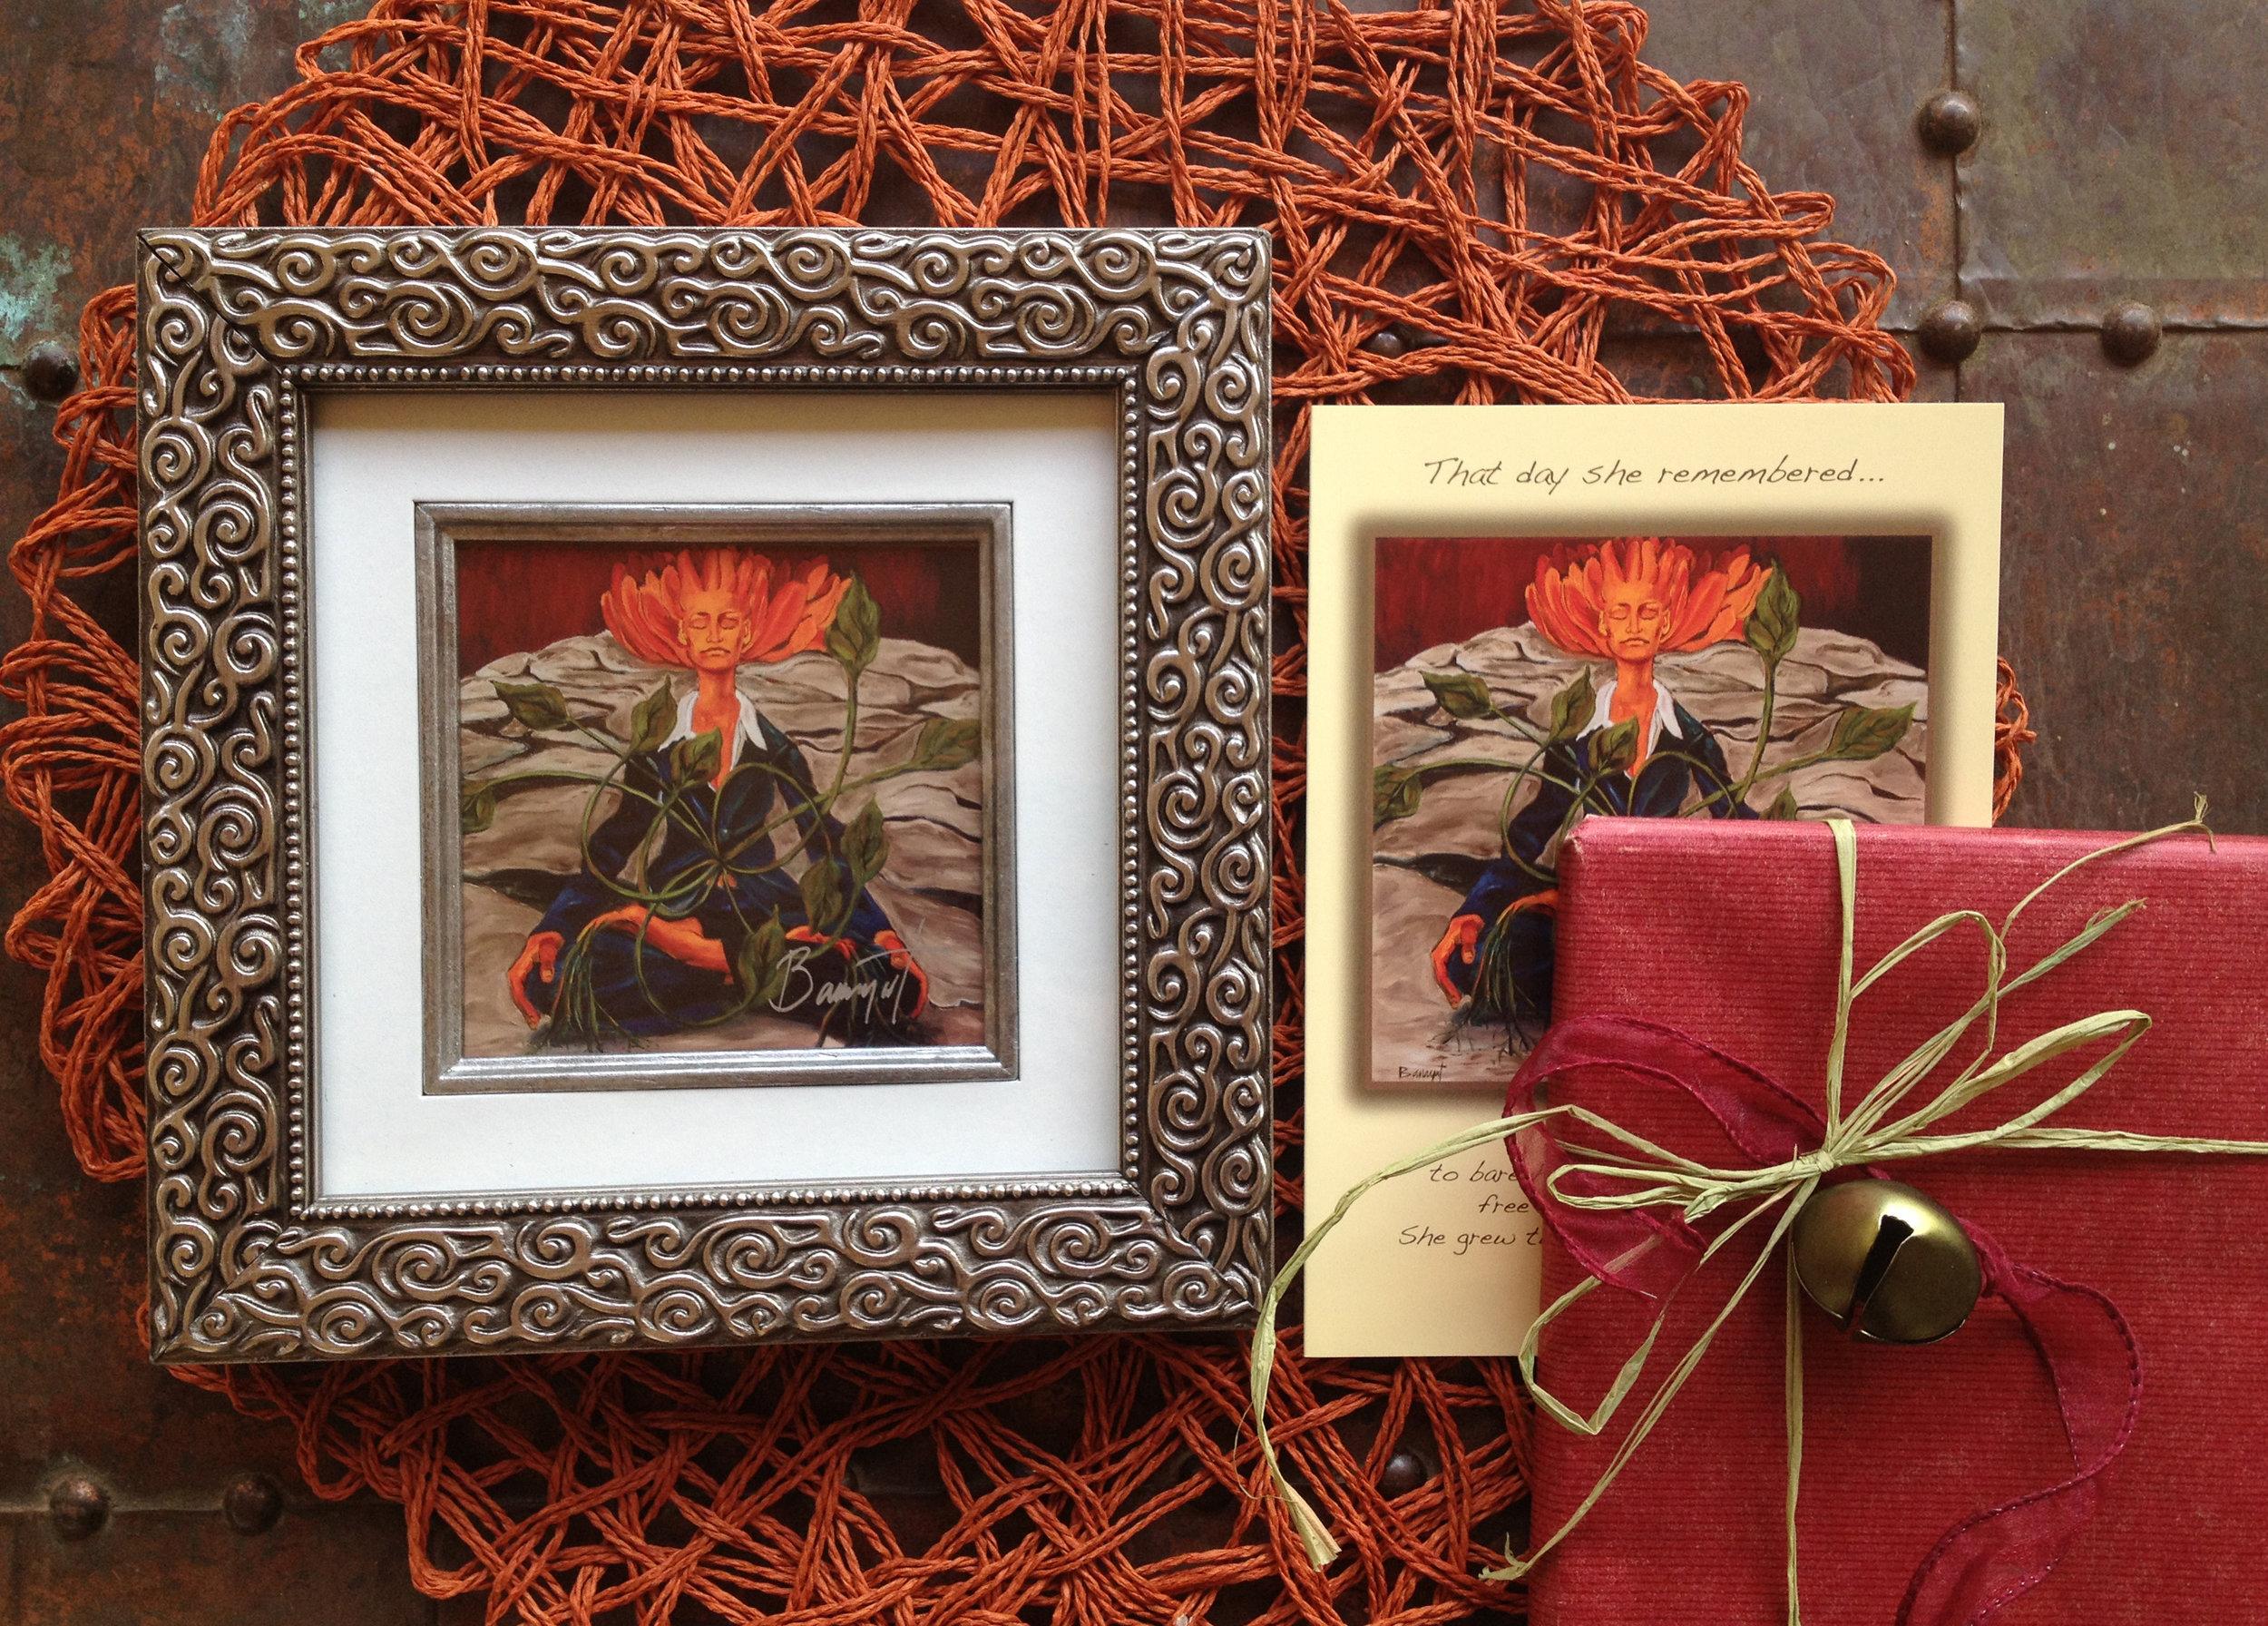 gift-set-frame-notecard-grounded-orange-backdrop-banayat-3.jpg